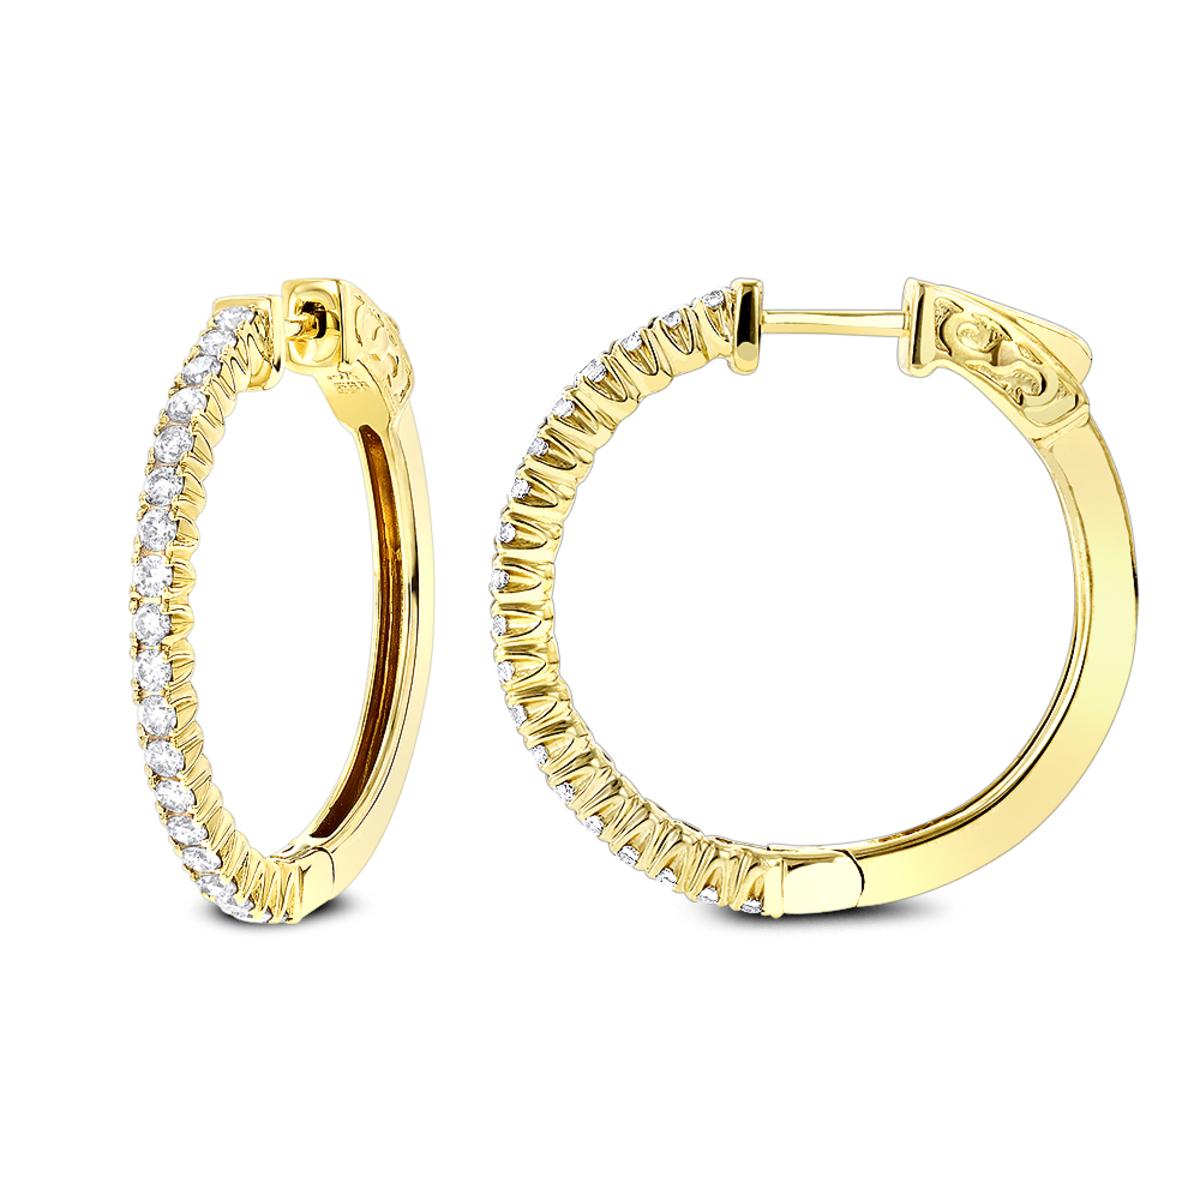 1 Inch Diamond Hoop Earrings 0.86ct 14K Gold